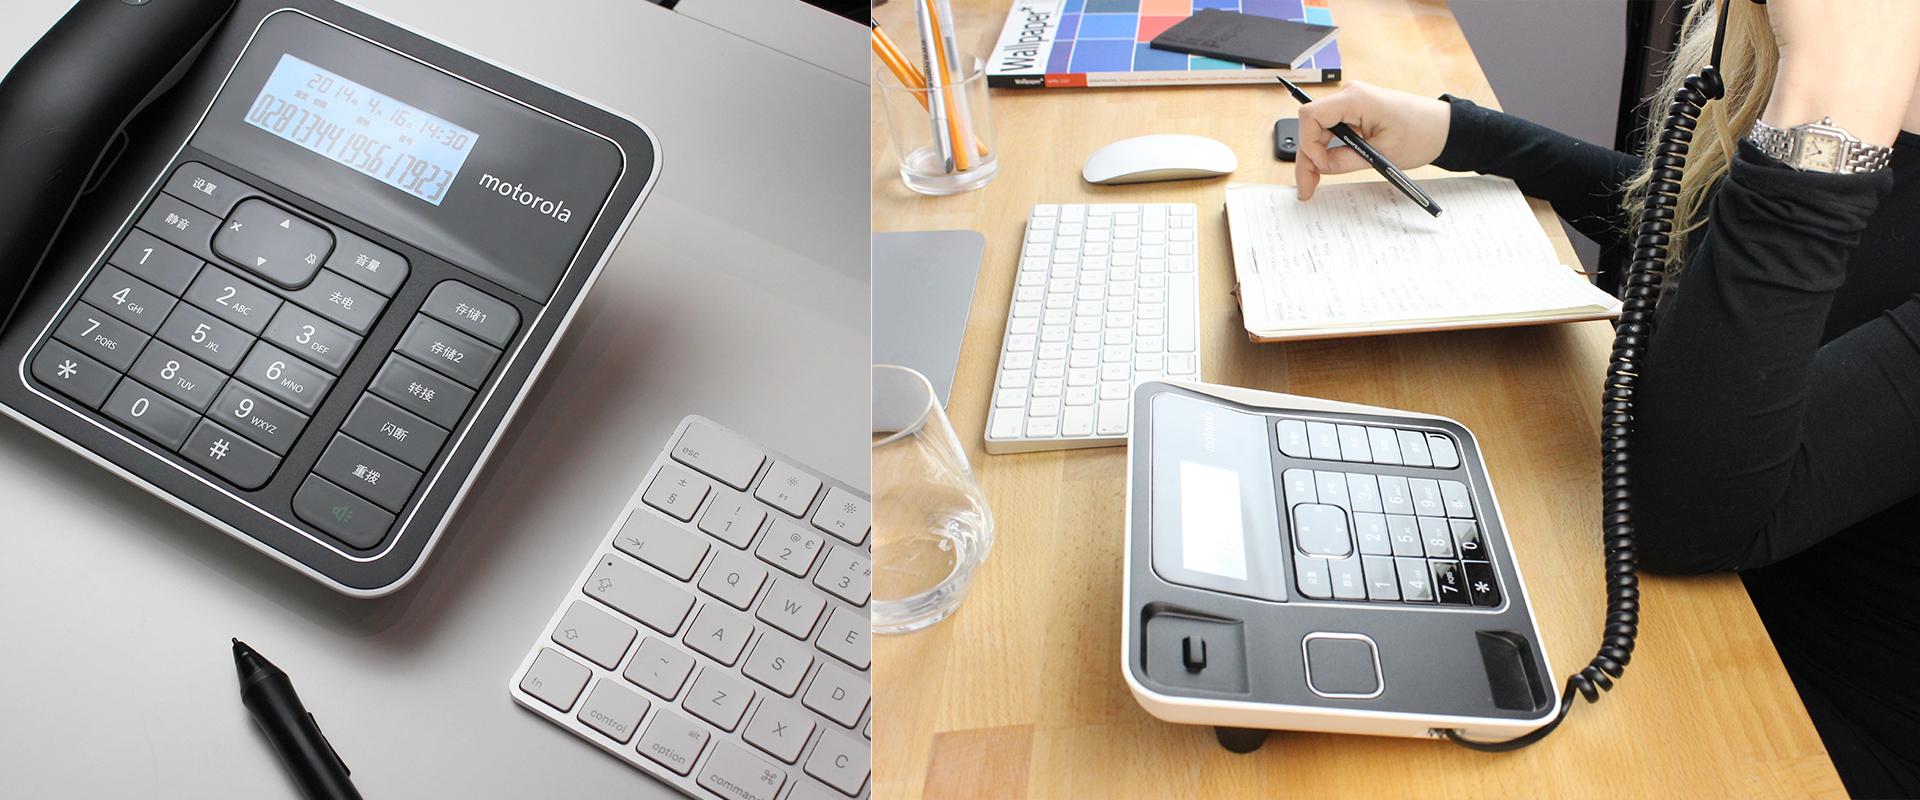 Motorola Office | Easy press